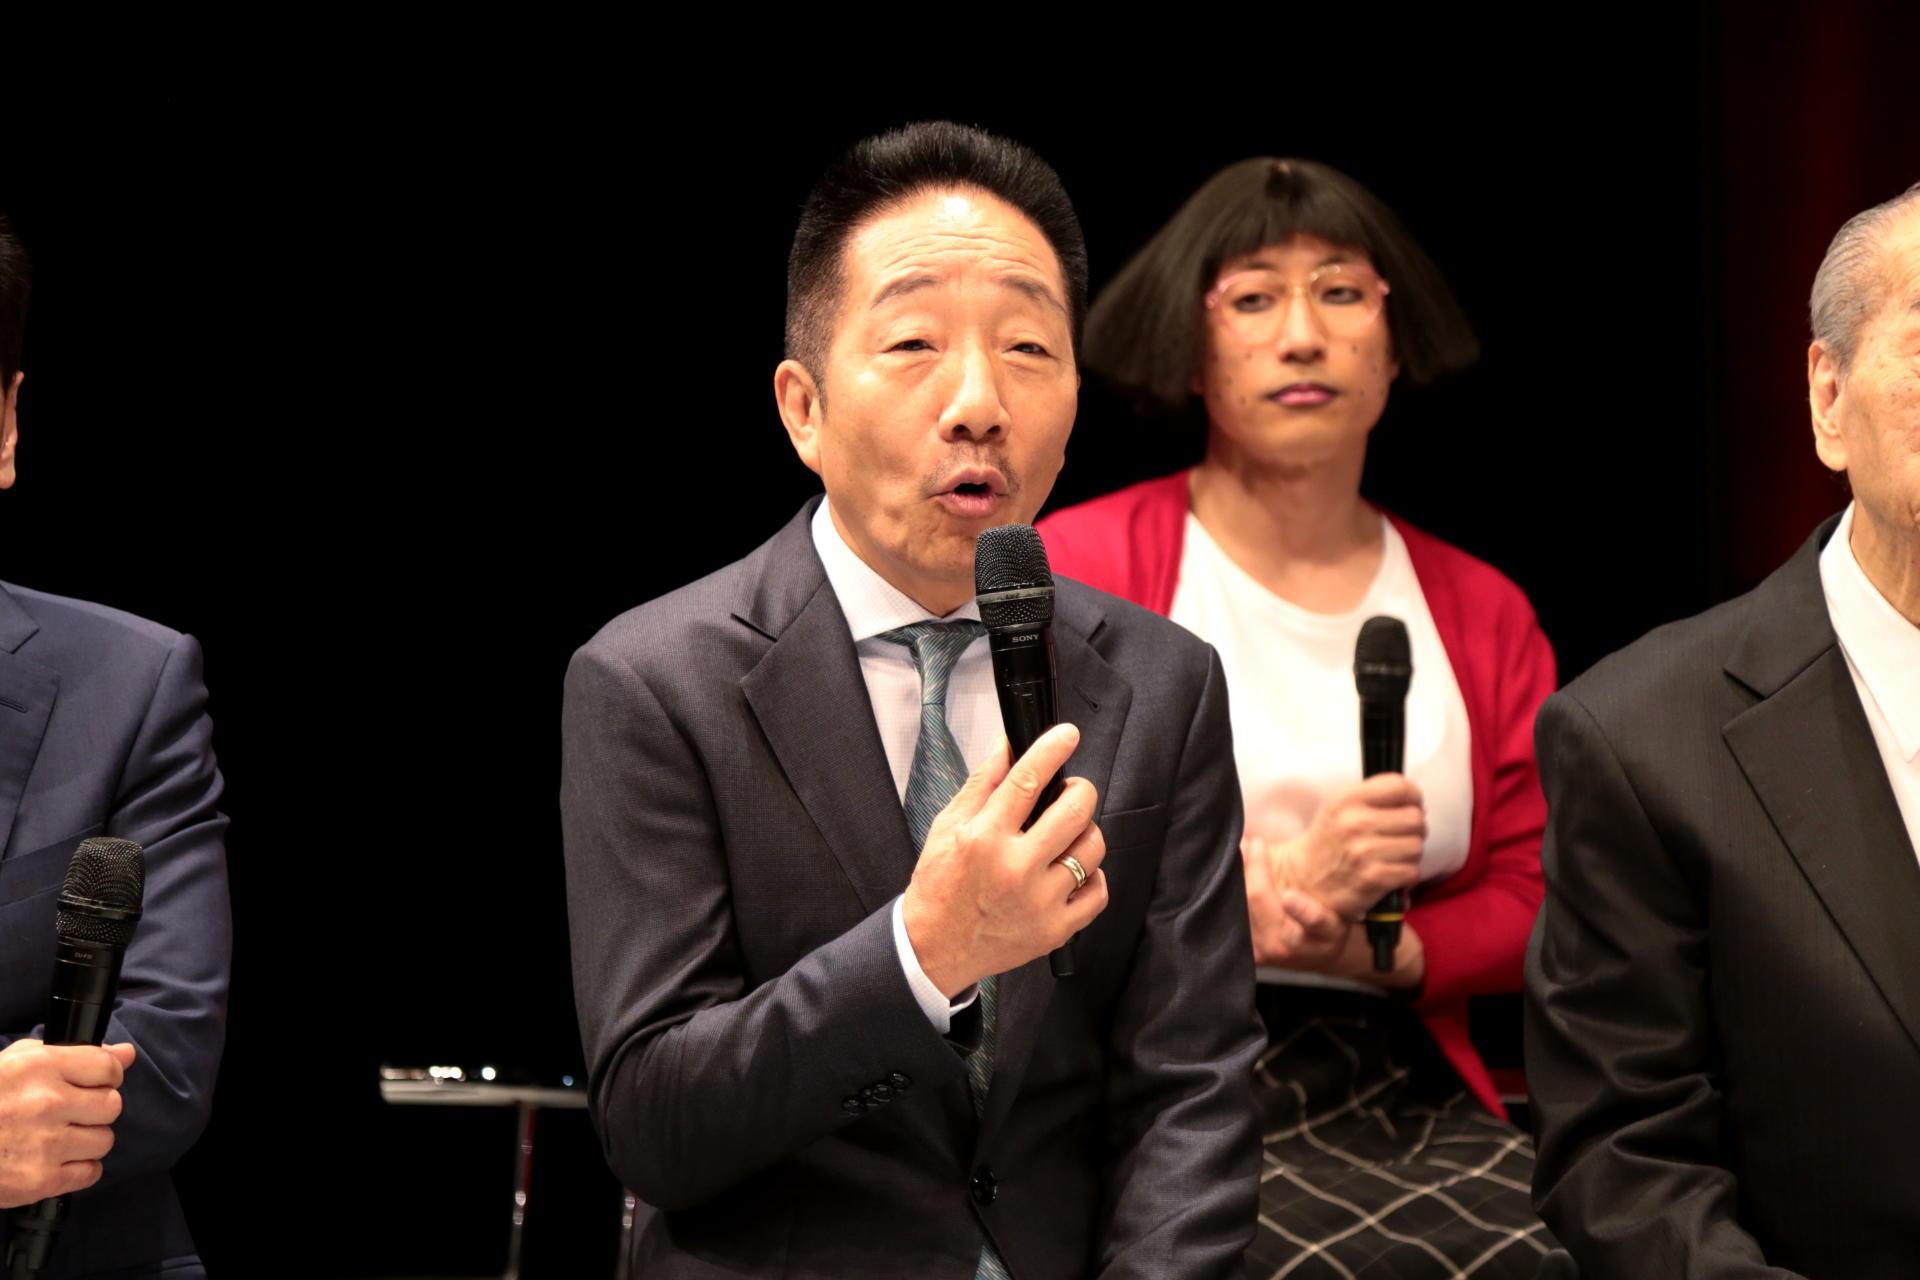 http://news.yoshimoto.co.jp/20180417124957-acce7442ed92c287d76342eec1f49f1c286bcf14.jpg